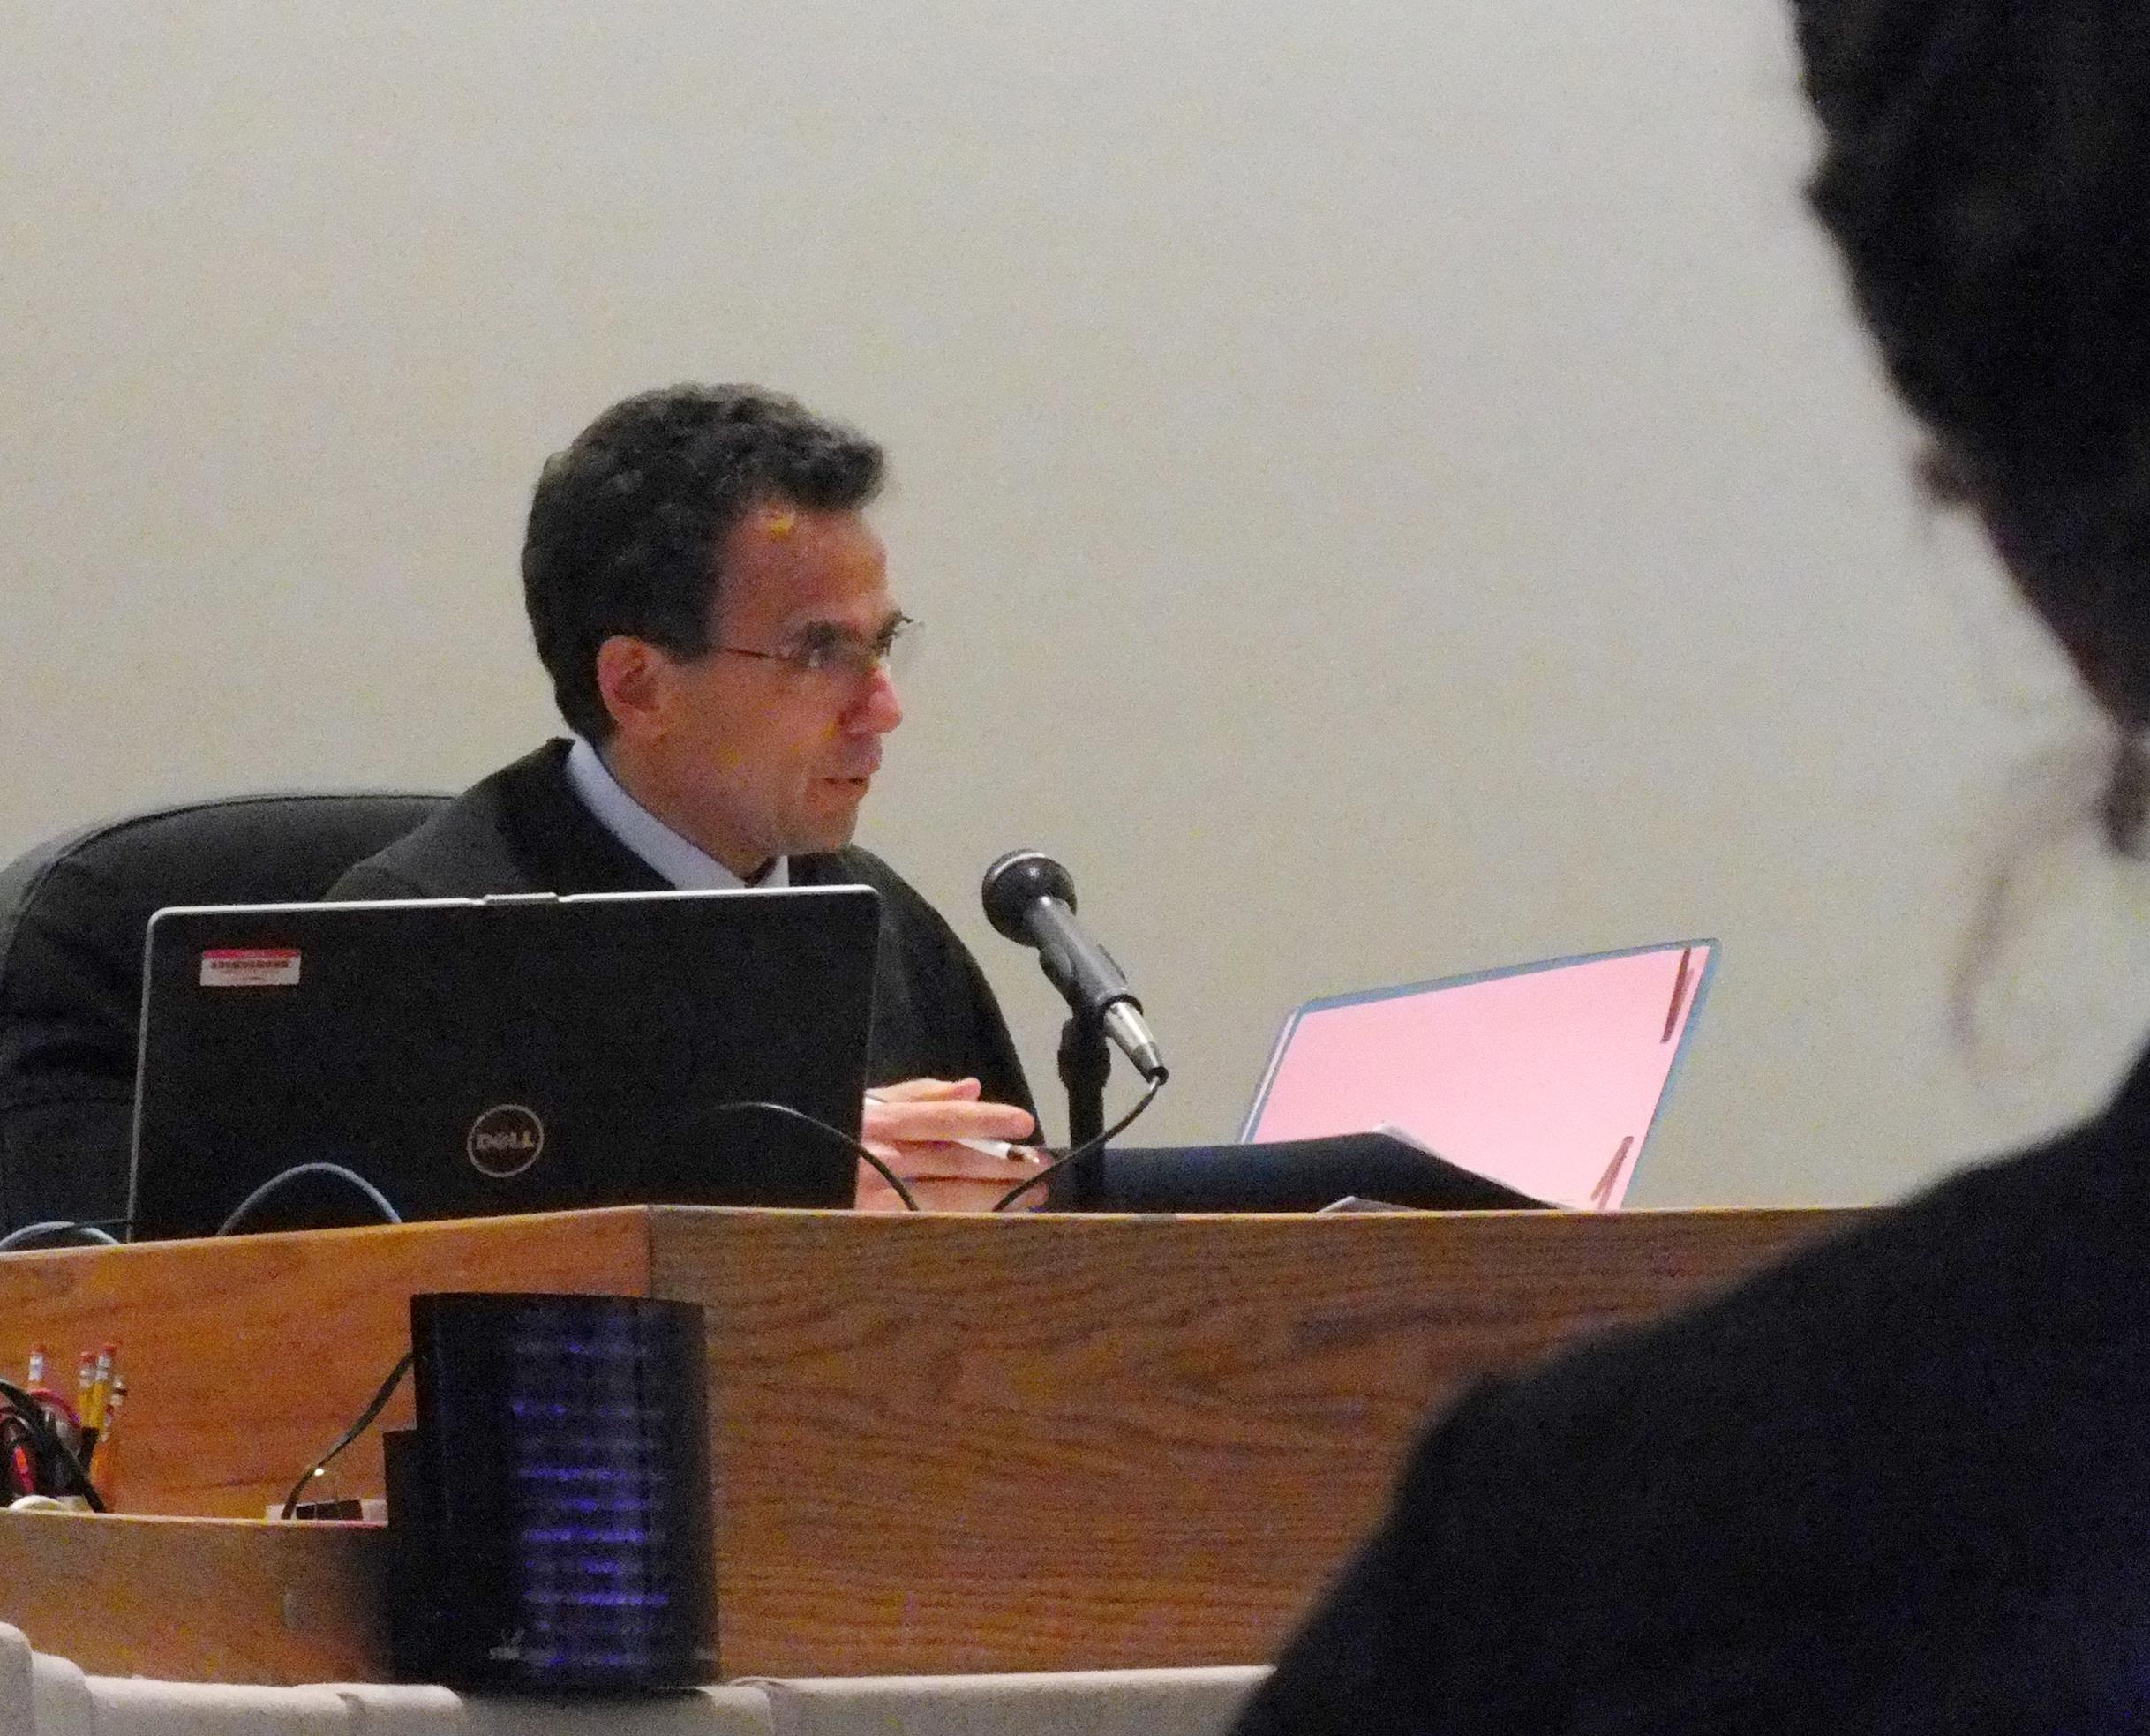 Juneau District Court Judge Keith Levy